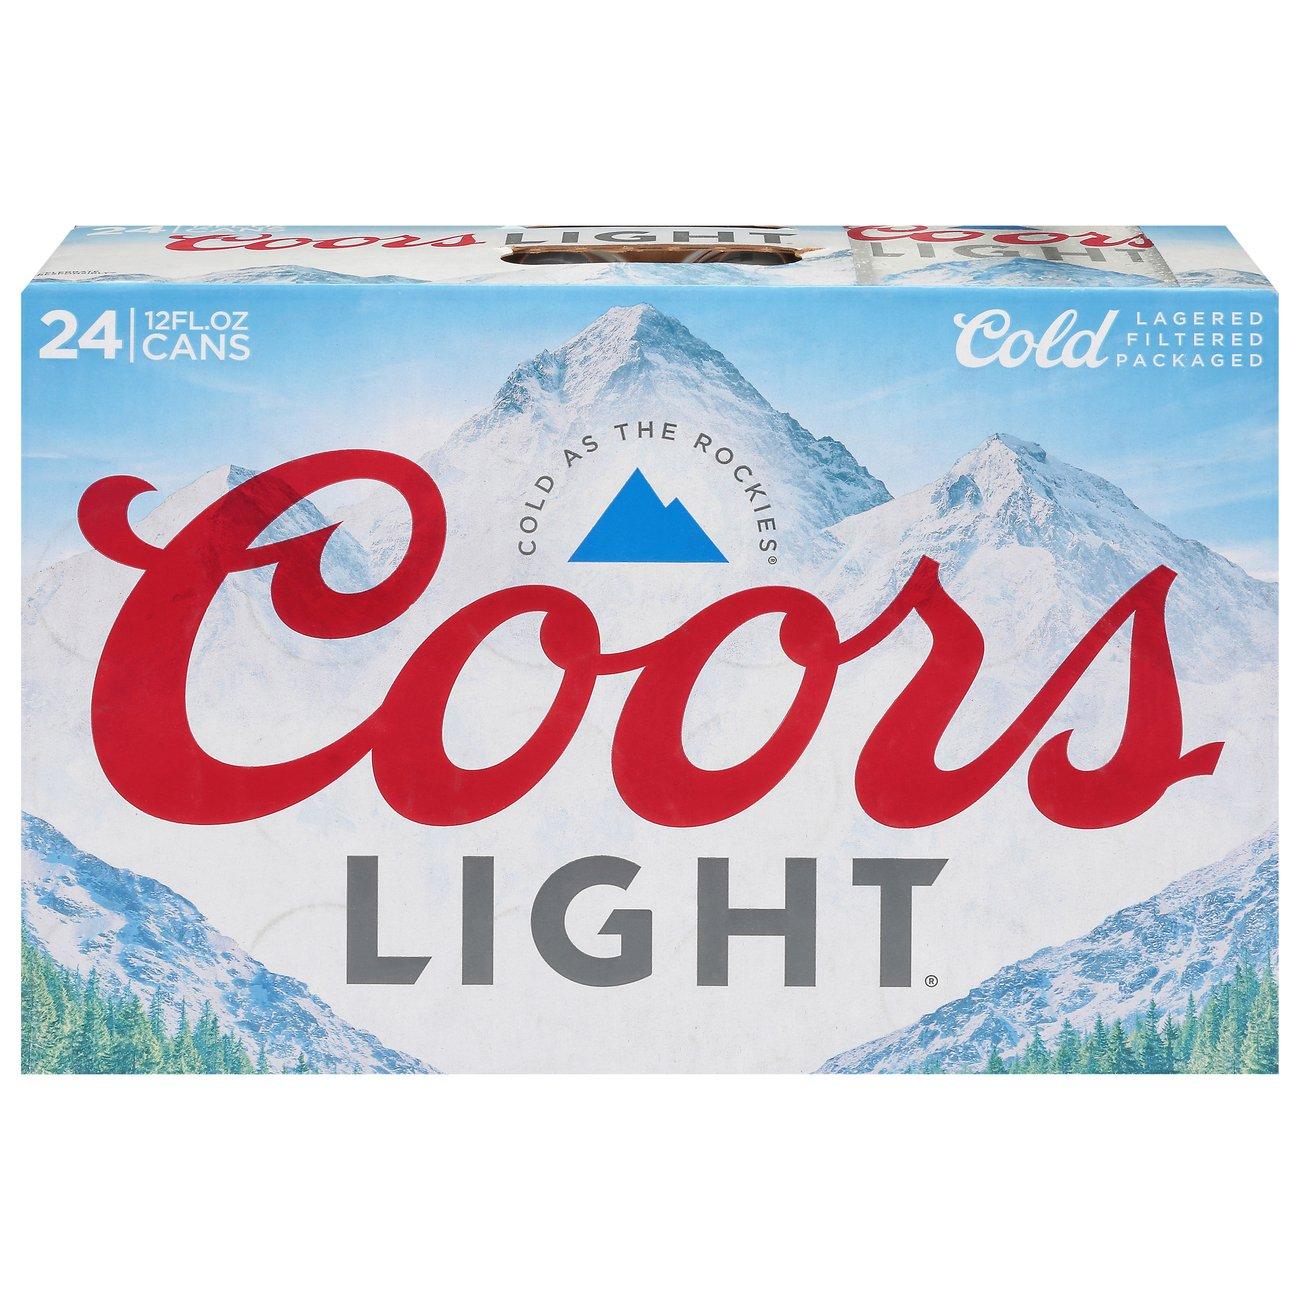 Nice Coors Light Beer 12 Oz Cans U2011 Shop Coors Light Beer 12 Oz Cans U2011 Shop Coors  Light Beer 12 Oz Cans U2011 Shop Coors Light Beer 12 Oz Cans U2011 Shop ... Ideas